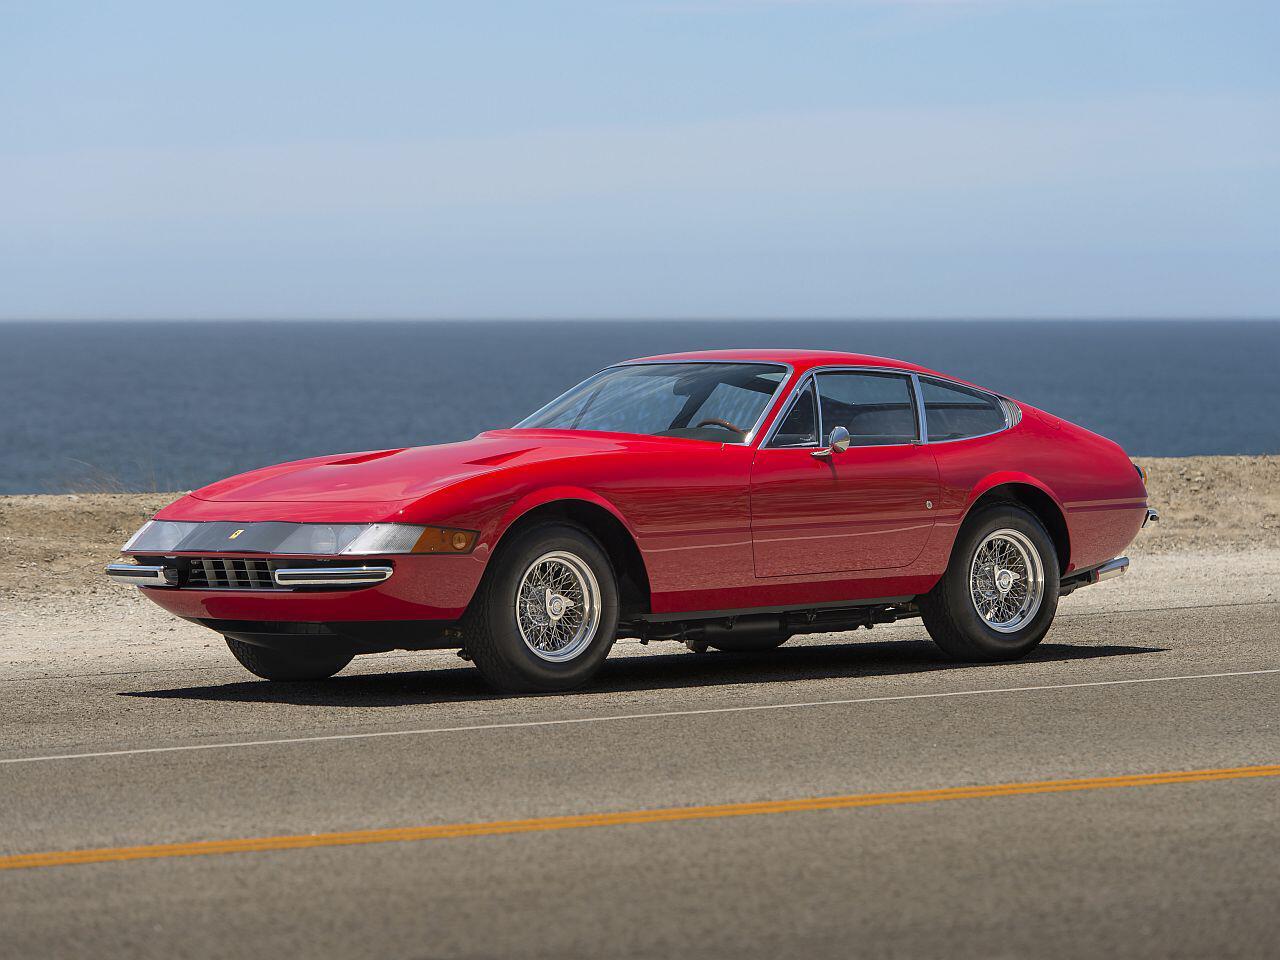 Bild zu 1970 Ferrari 365 GTB4 Daytona Berlinetta